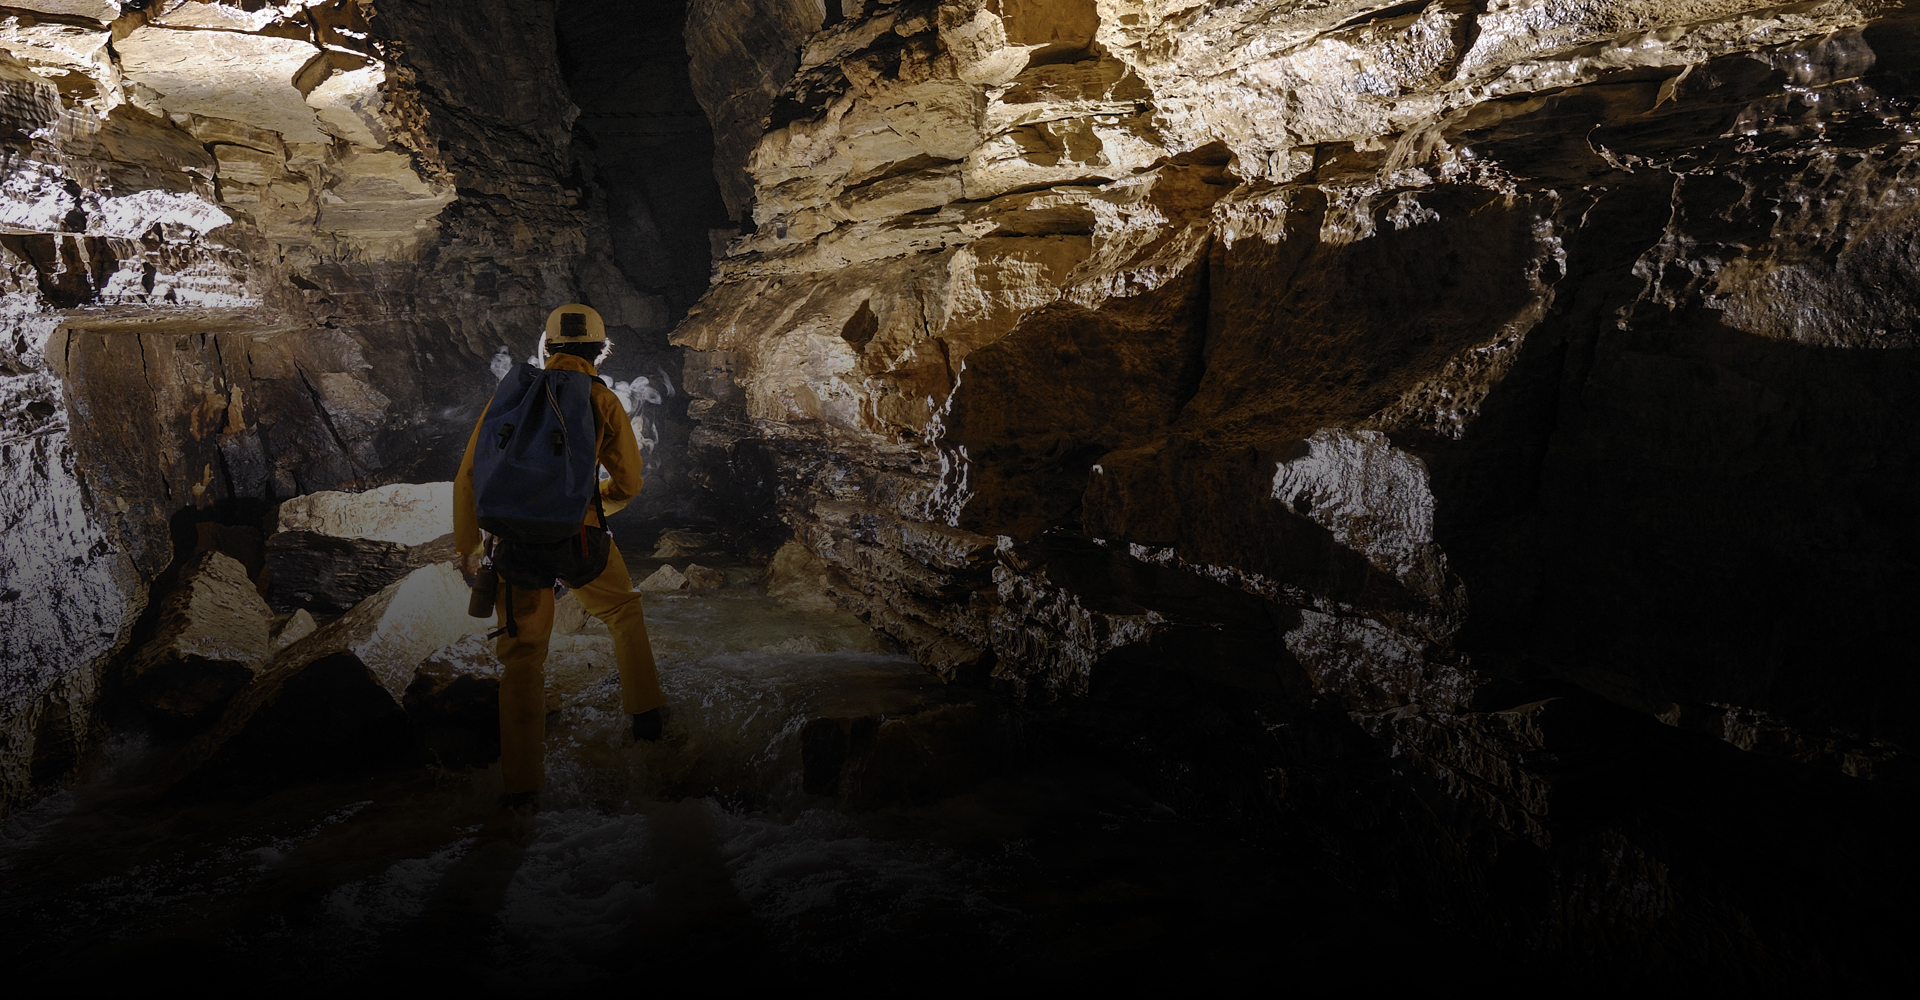 La Chartreuse l aventure de la speleologie